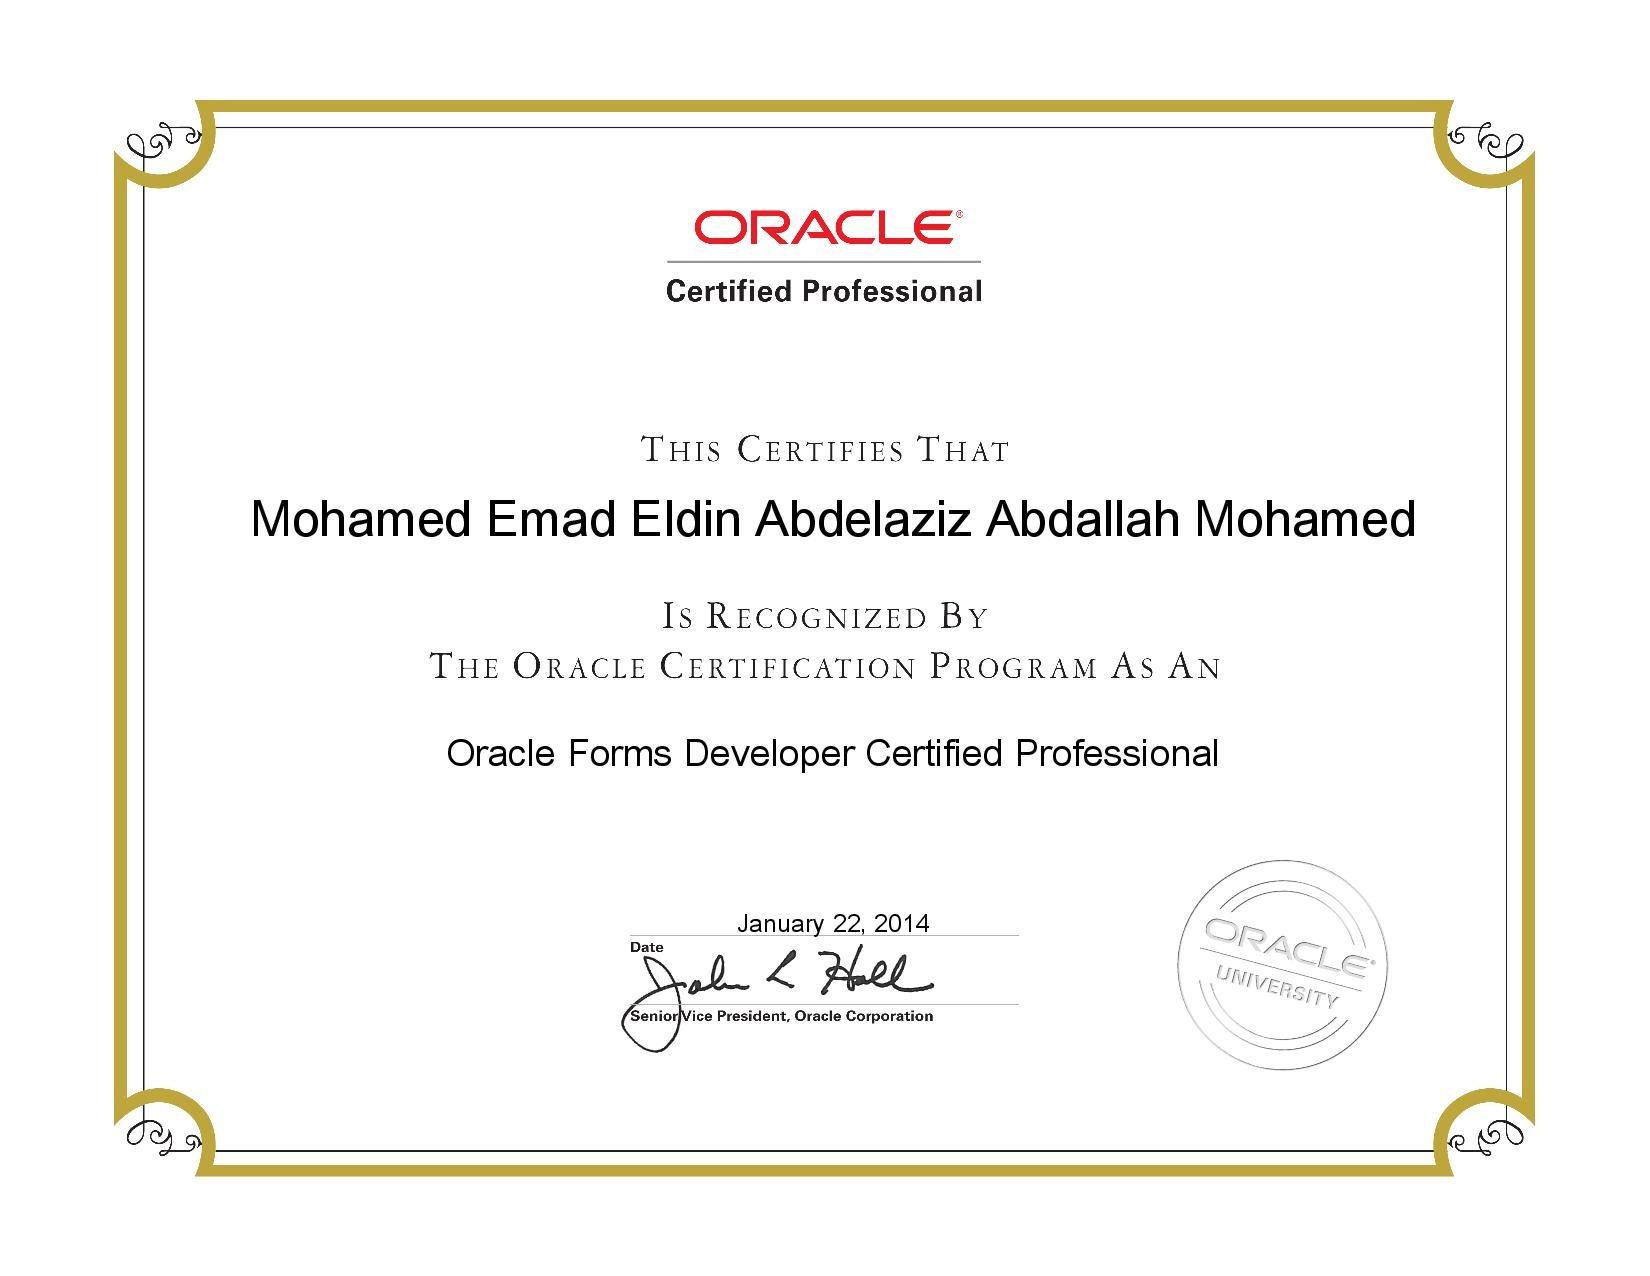 Mohamed emad eldin abdelaziz abdallah mohamed bayt oracle forms developer certified professional ocp certificate xflitez Image collections